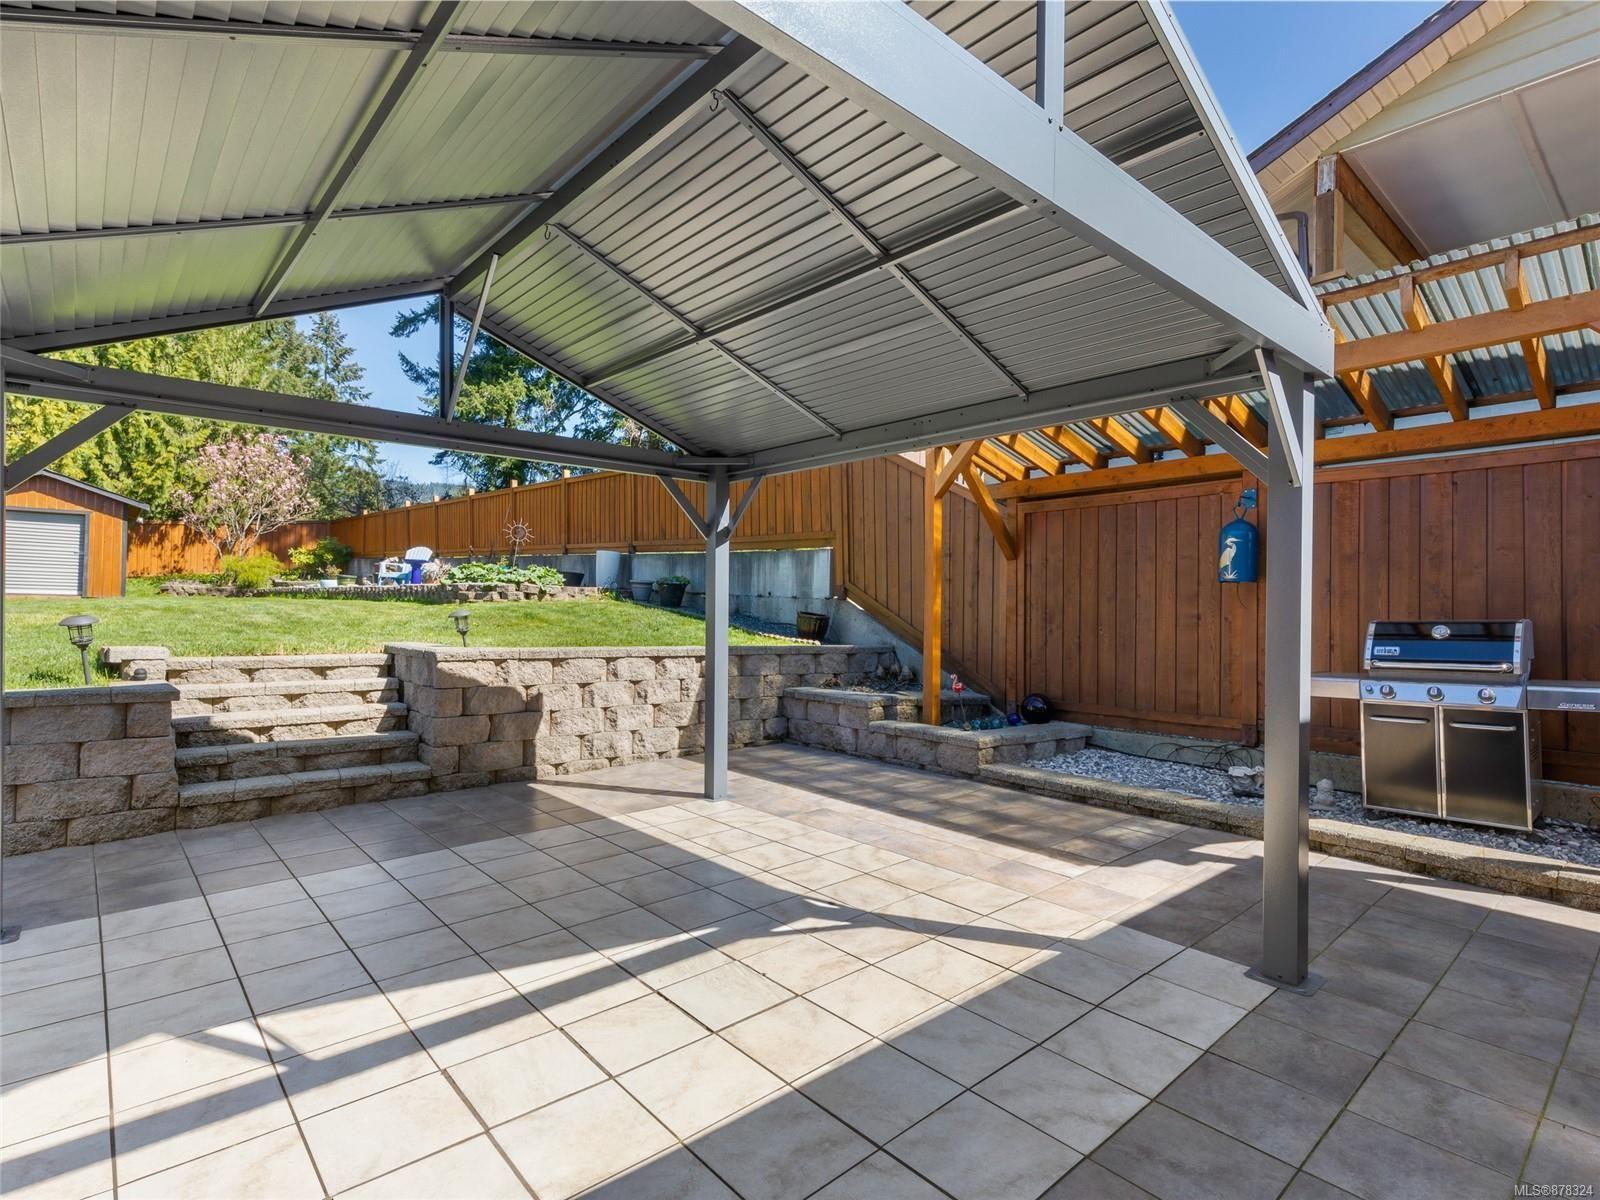 Photo 14: Photos: 3875 Moore Rd in : PA Port Alberni House for sale (Port Alberni)  : MLS®# 878324